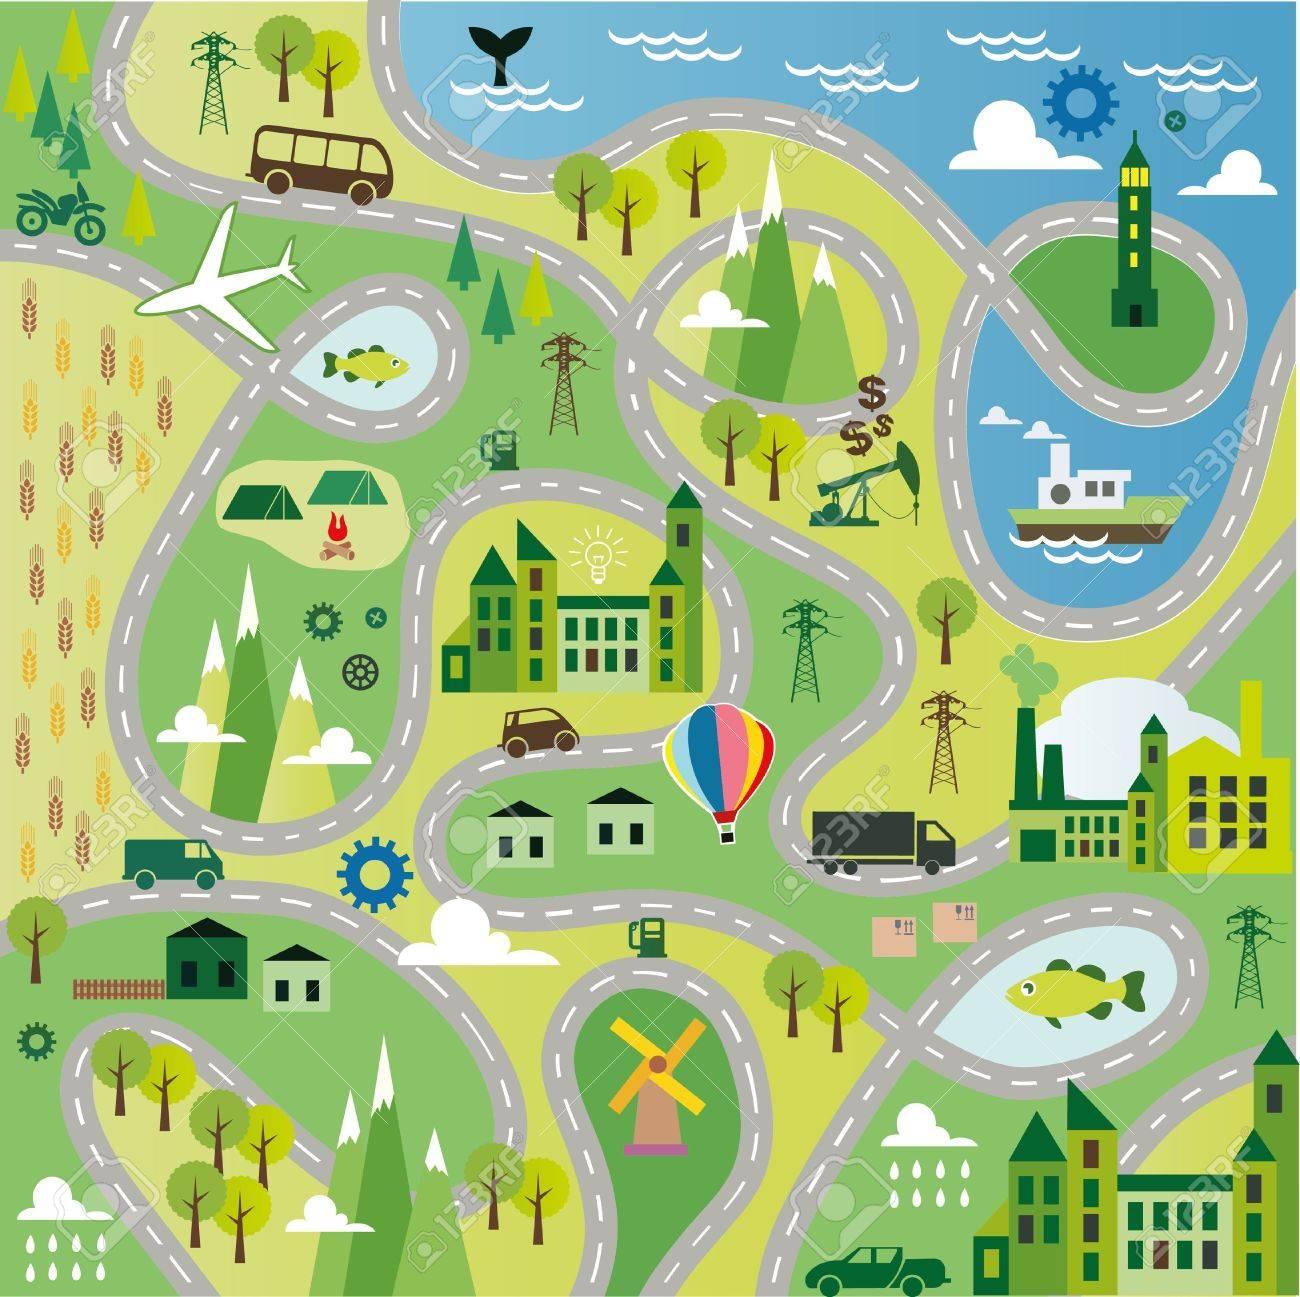 cartoon map royalty free cliparts vectors and stock illustration image 36880702 cartoon map